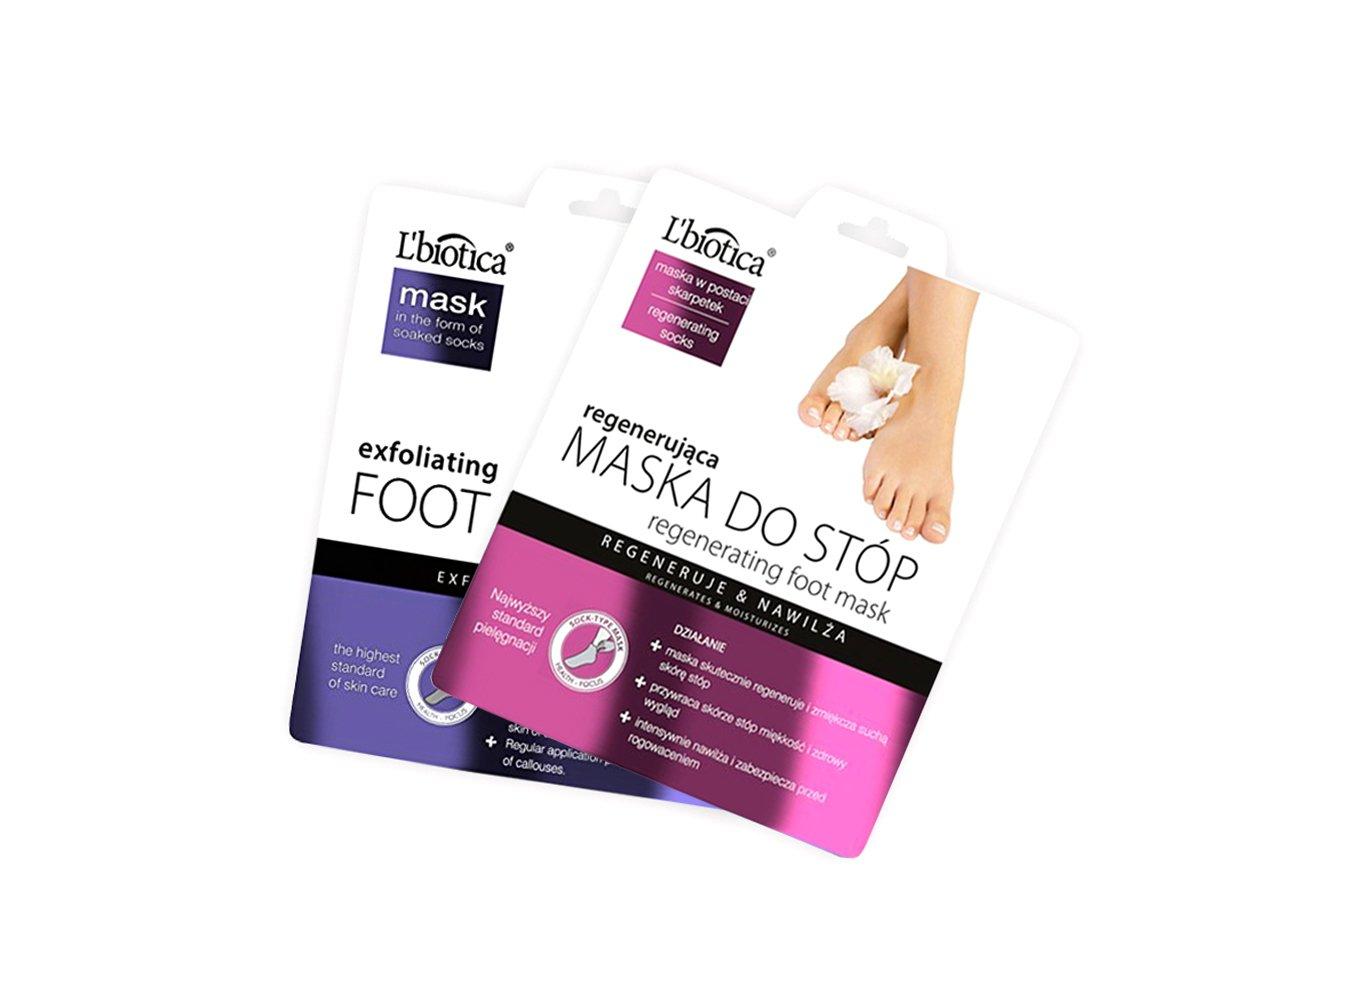 L'biotica Fußmaske, Peeling (1 x 40 ml), regenerierend (1 x 32 ml). L' biotica Fußmaske